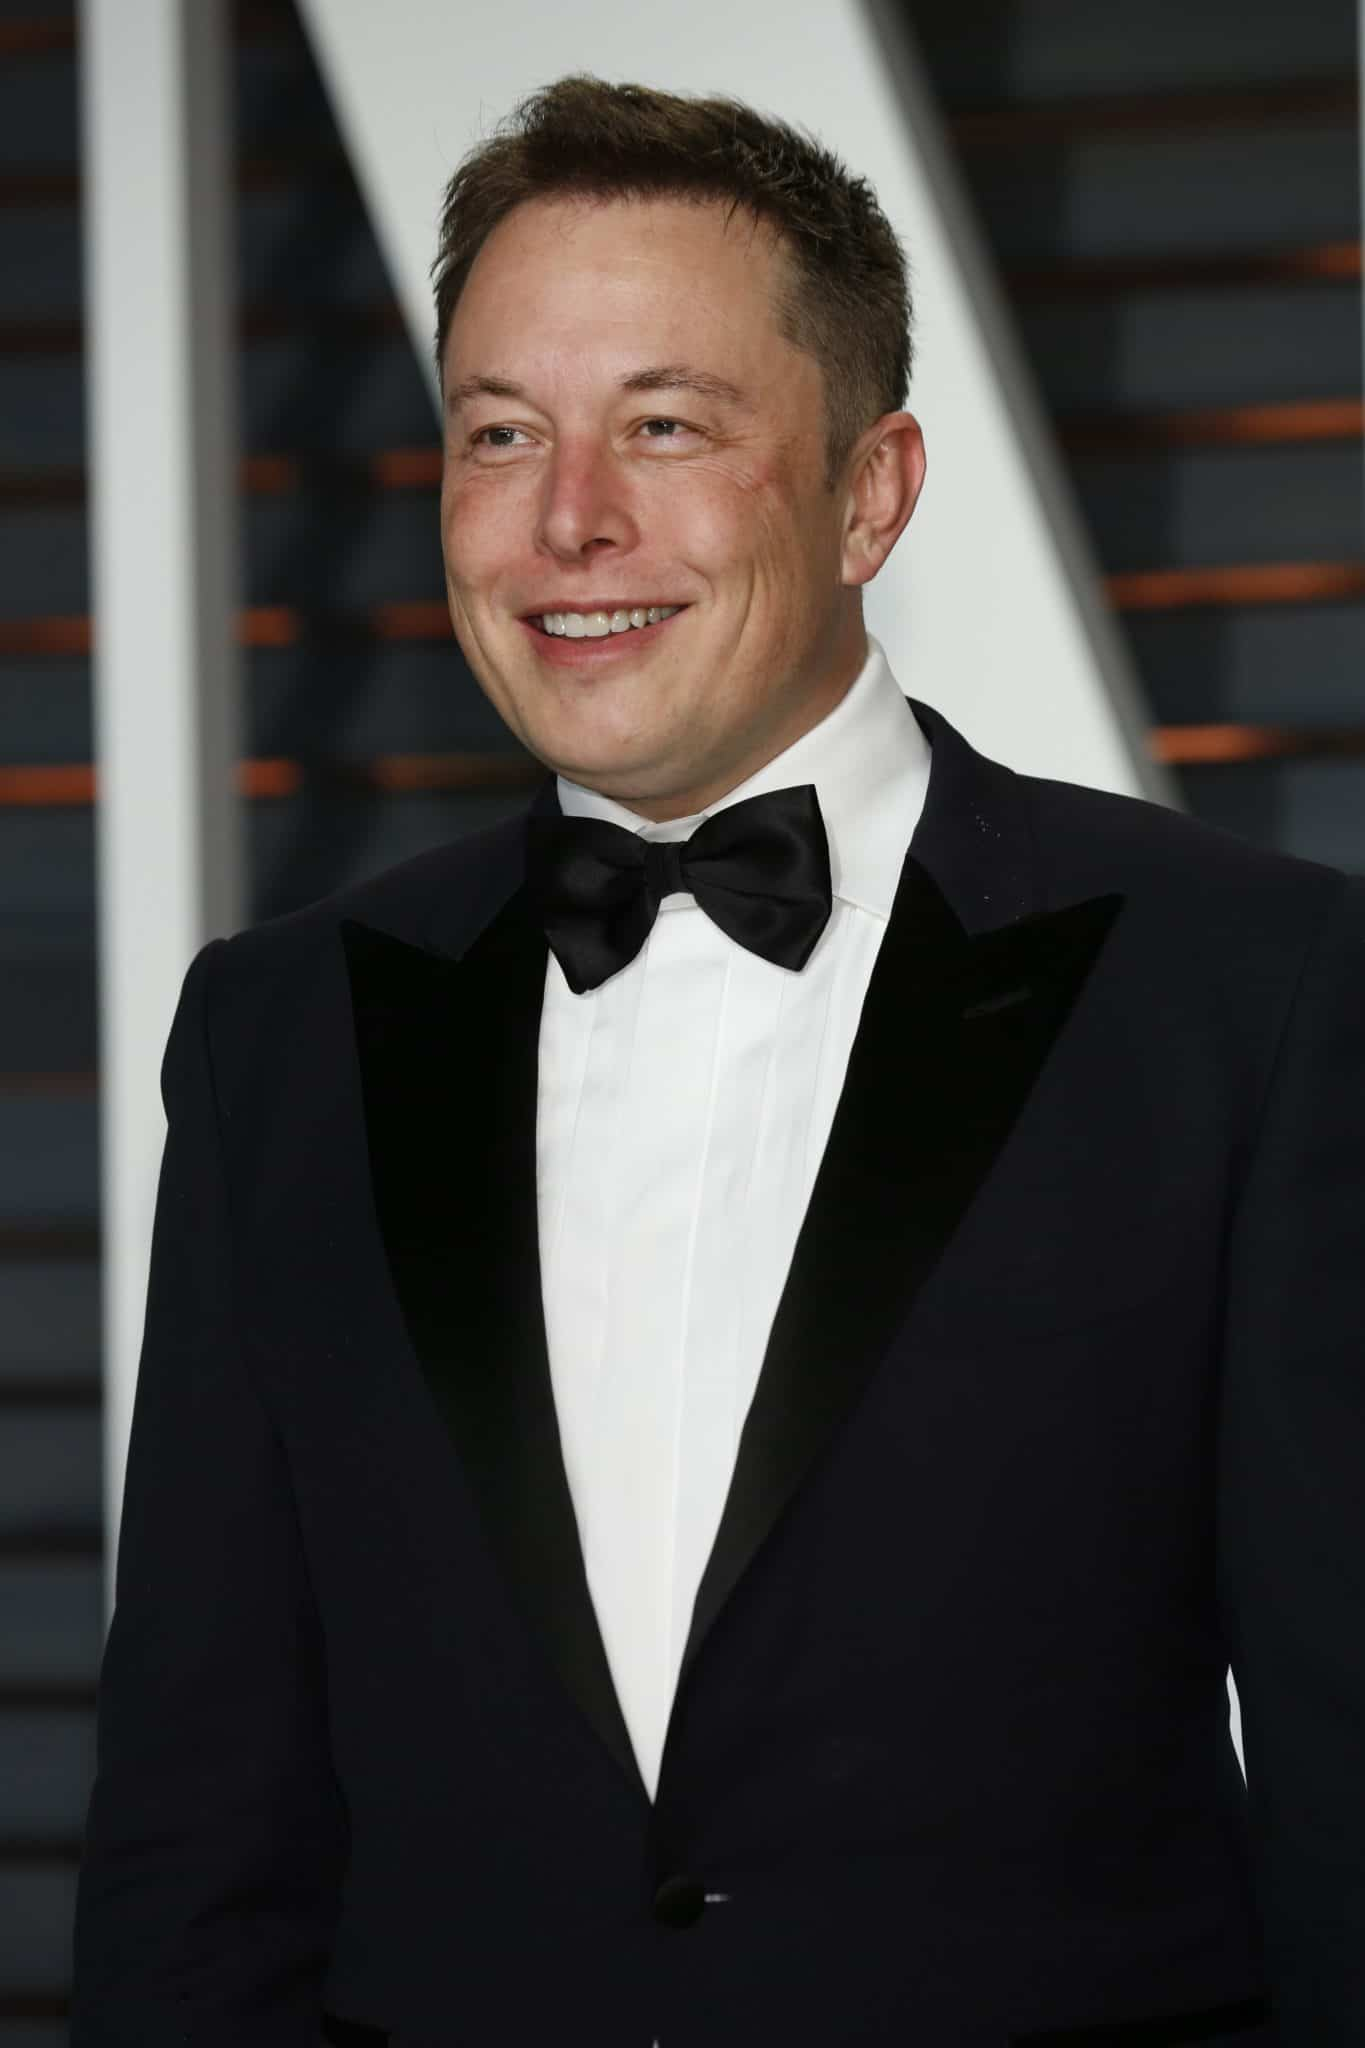 Elon Musk Lost Billions of Dollars in a Matter of Days